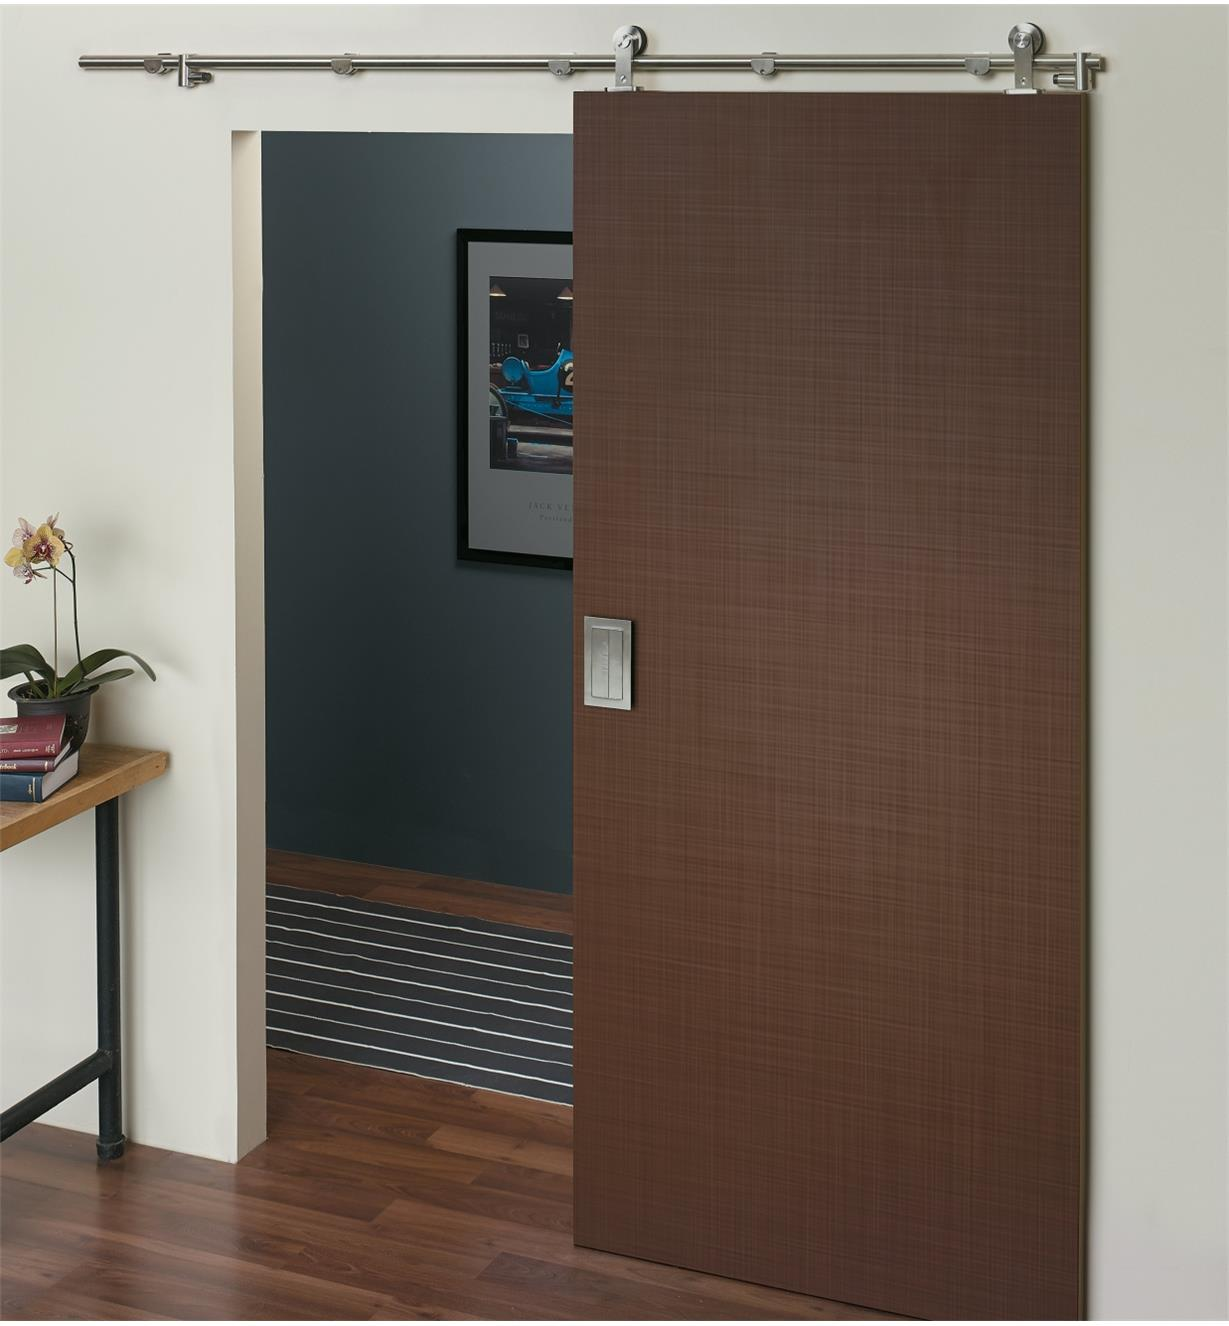 Example of door mounted with Stainless-Steel Barn-Style Door Hardware